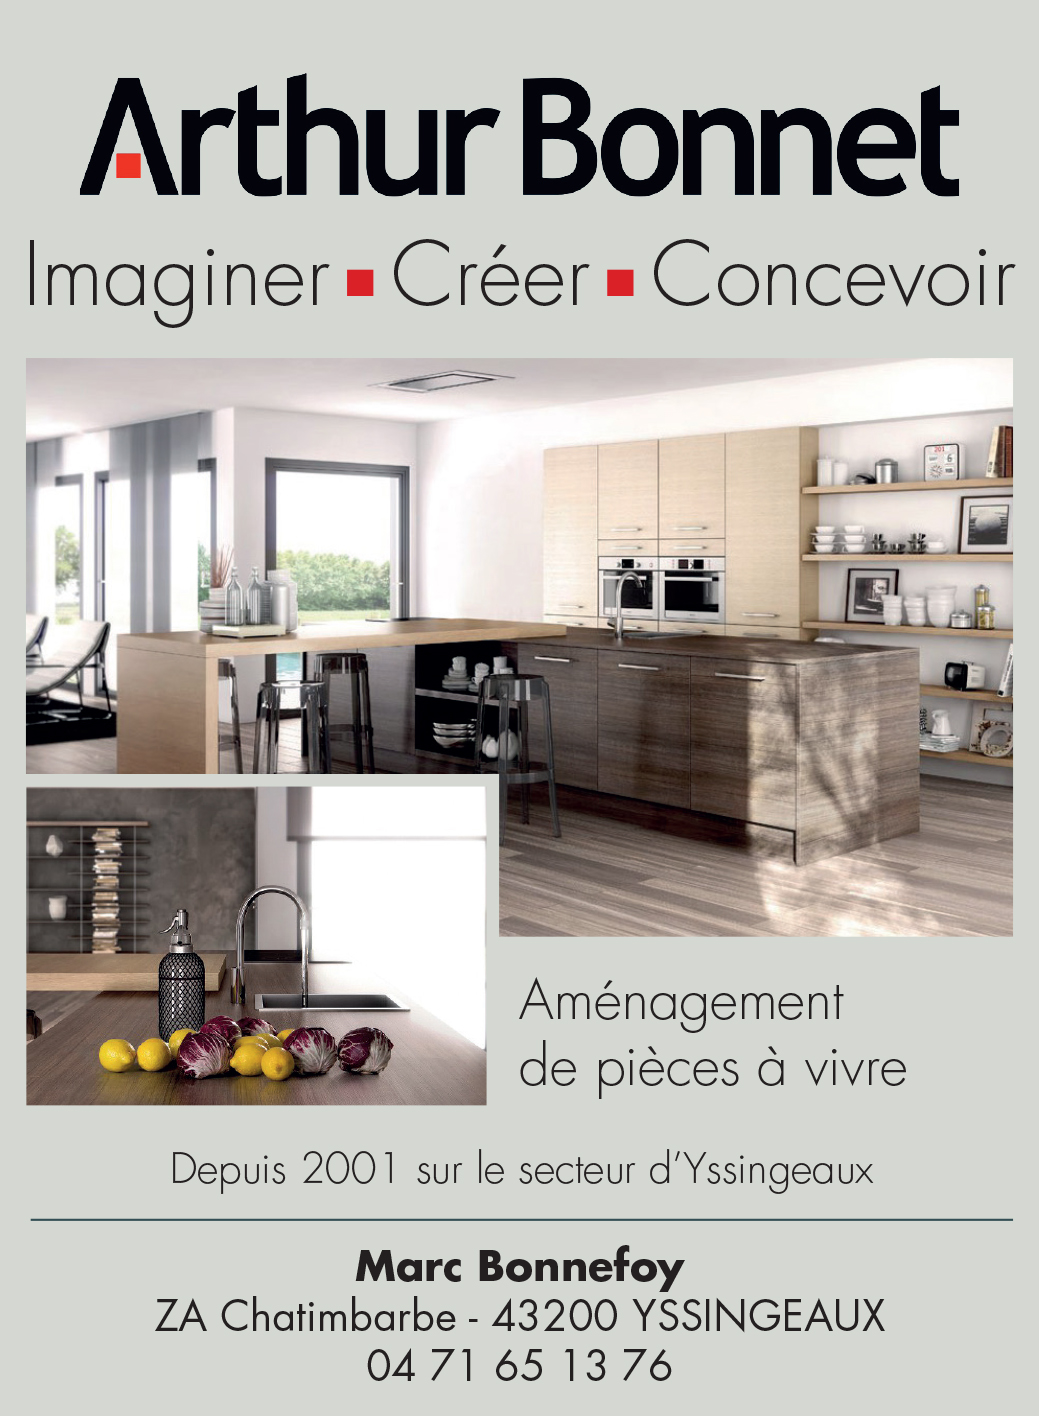 arthur bonnet yssingeaux cuisines quip esstrada. Black Bedroom Furniture Sets. Home Design Ideas